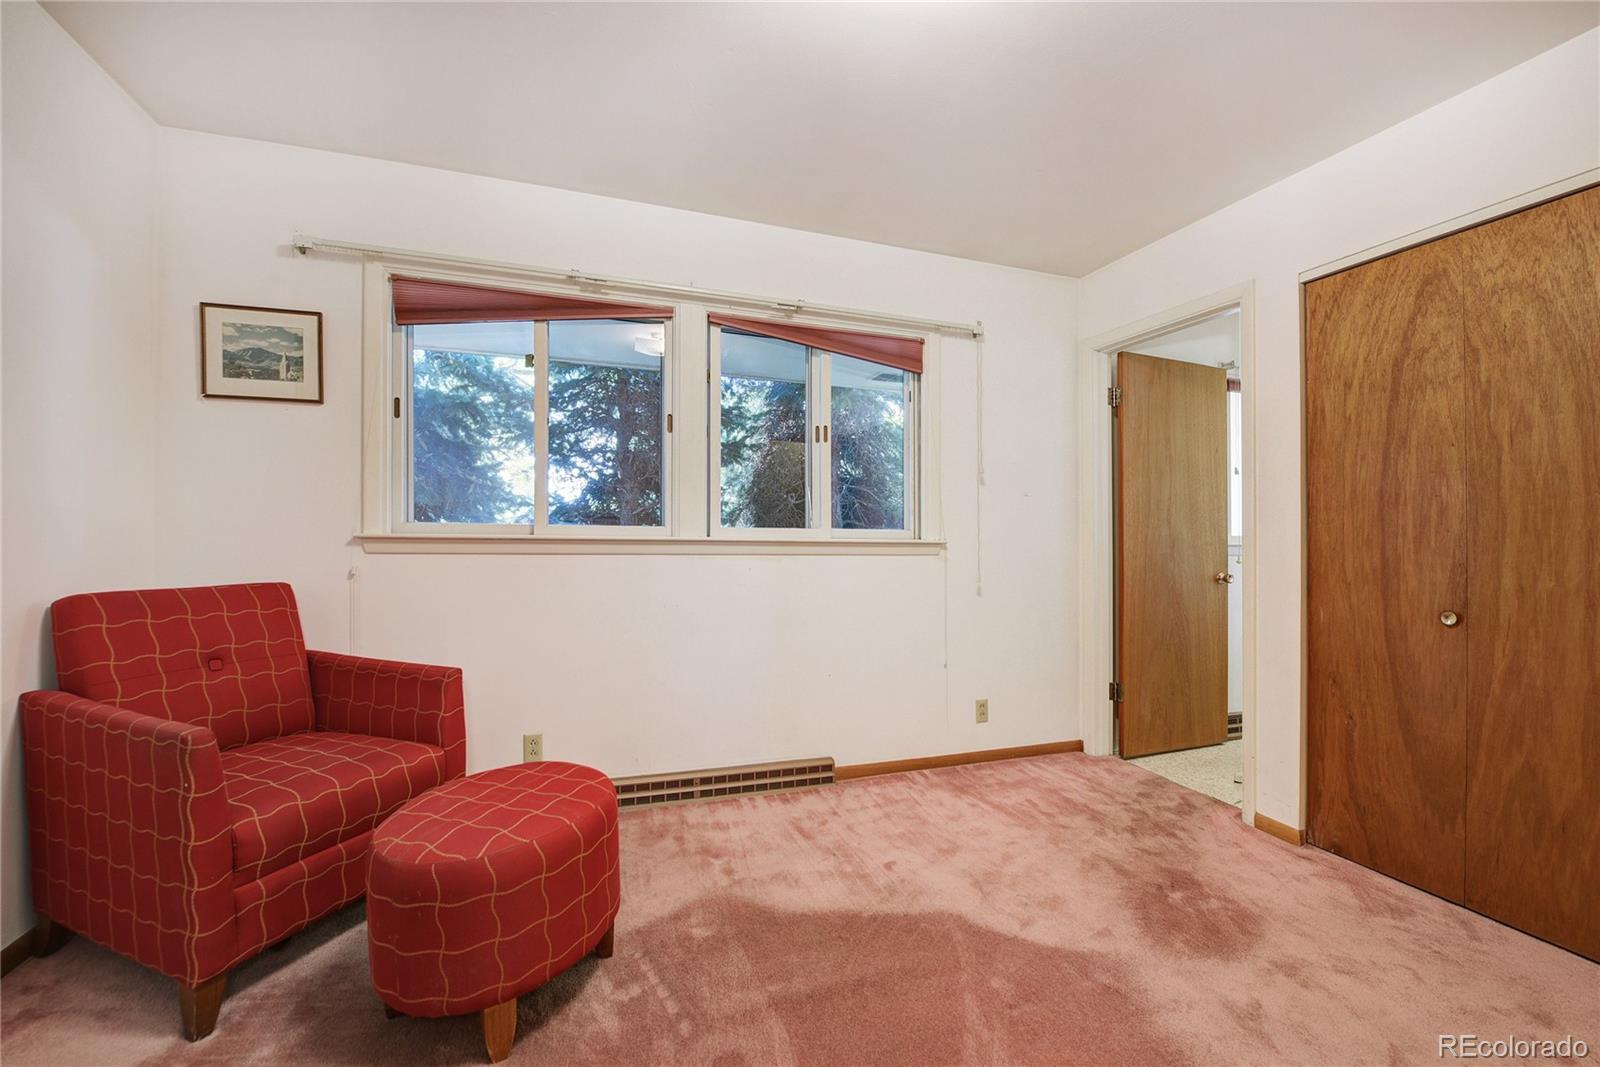 MLS# 3086362 - 25 - 2445 Balsam Drive, Boulder, CO 80304